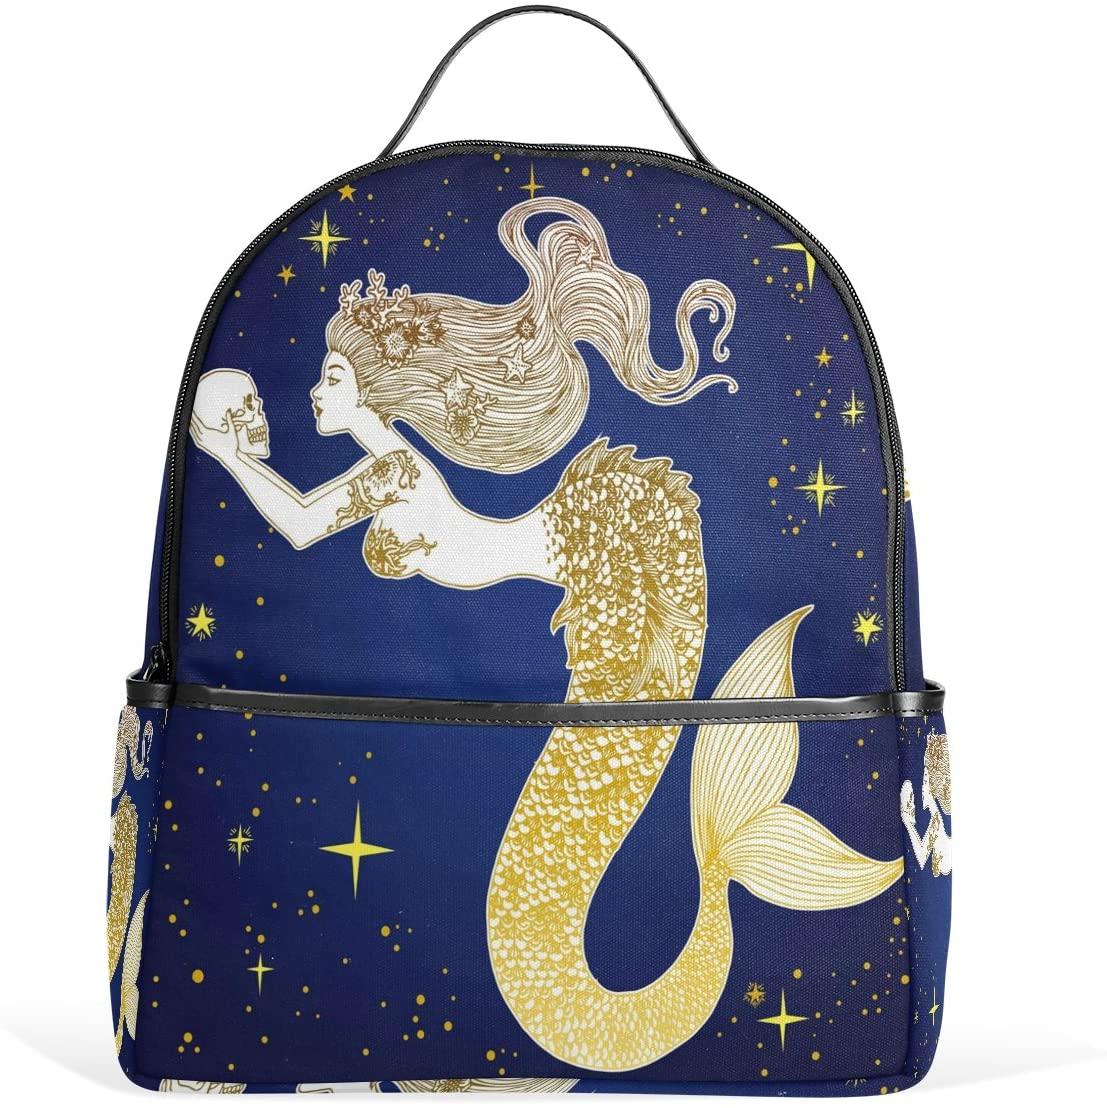 Use4 Mermaid Sugar Skull Polyester Backpack School Travel Bag